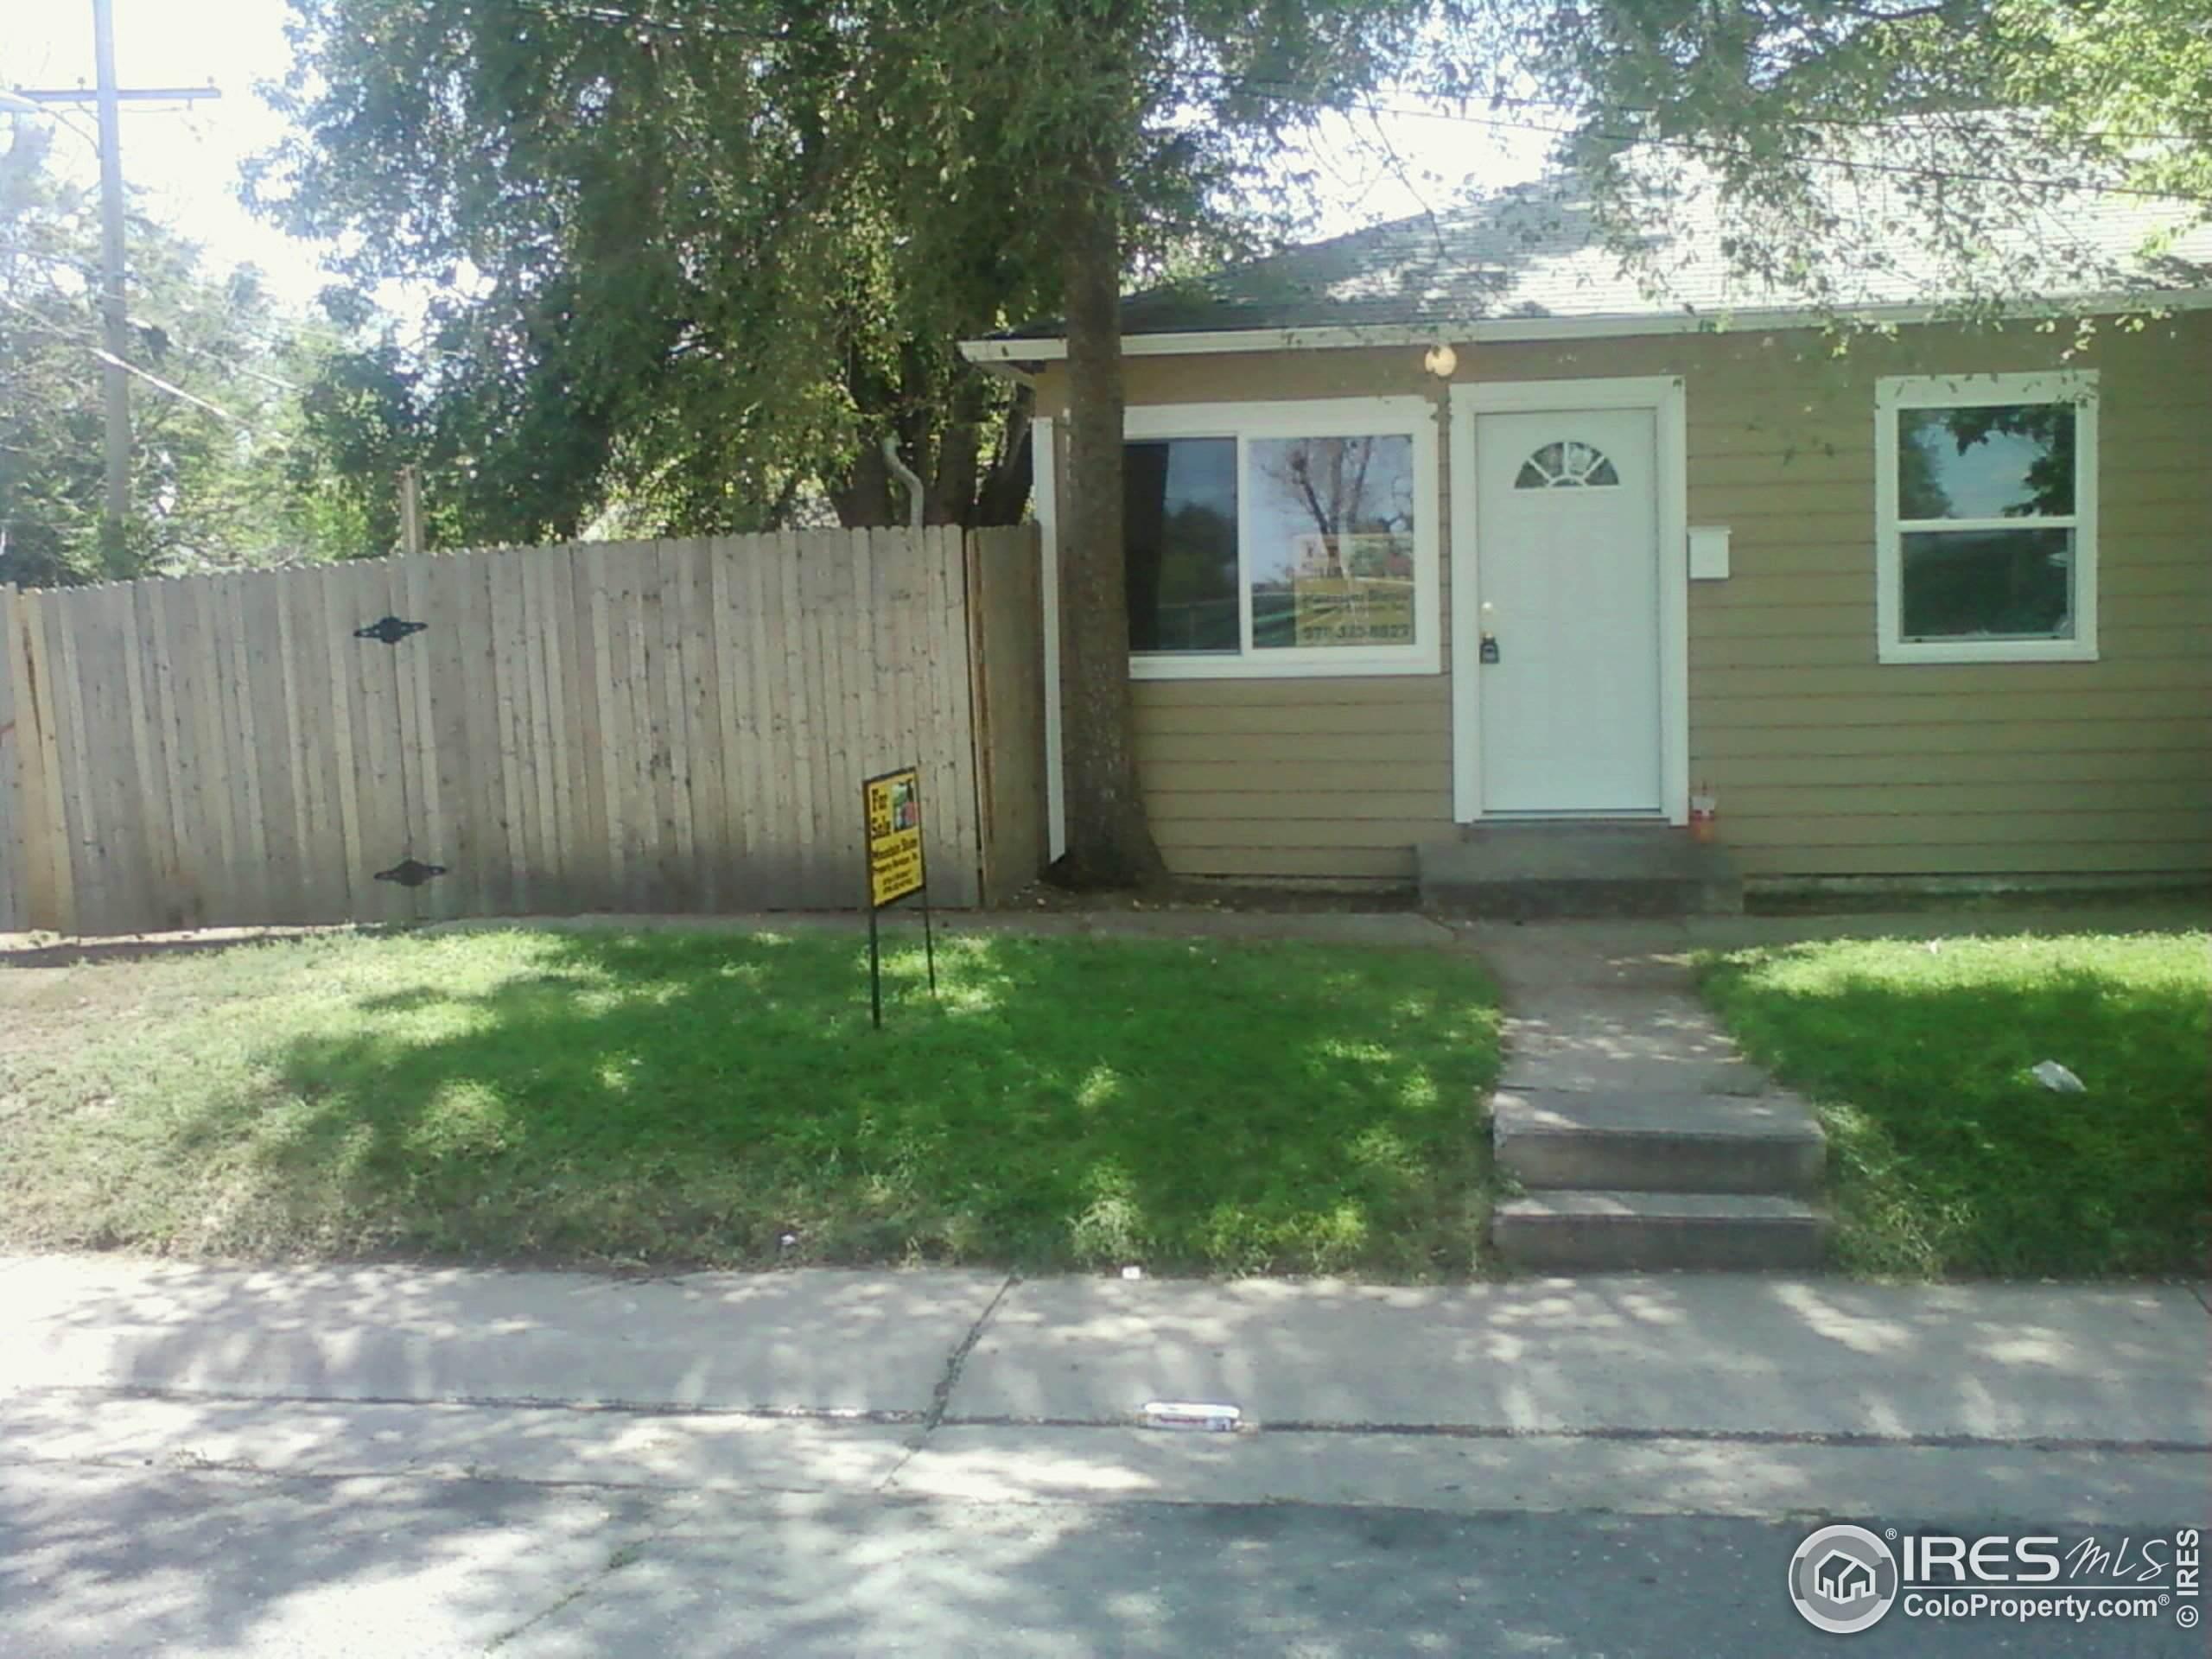 4524 14th St #7, Boulder, CO 80304 (MLS #937645) :: RE/MAX Alliance